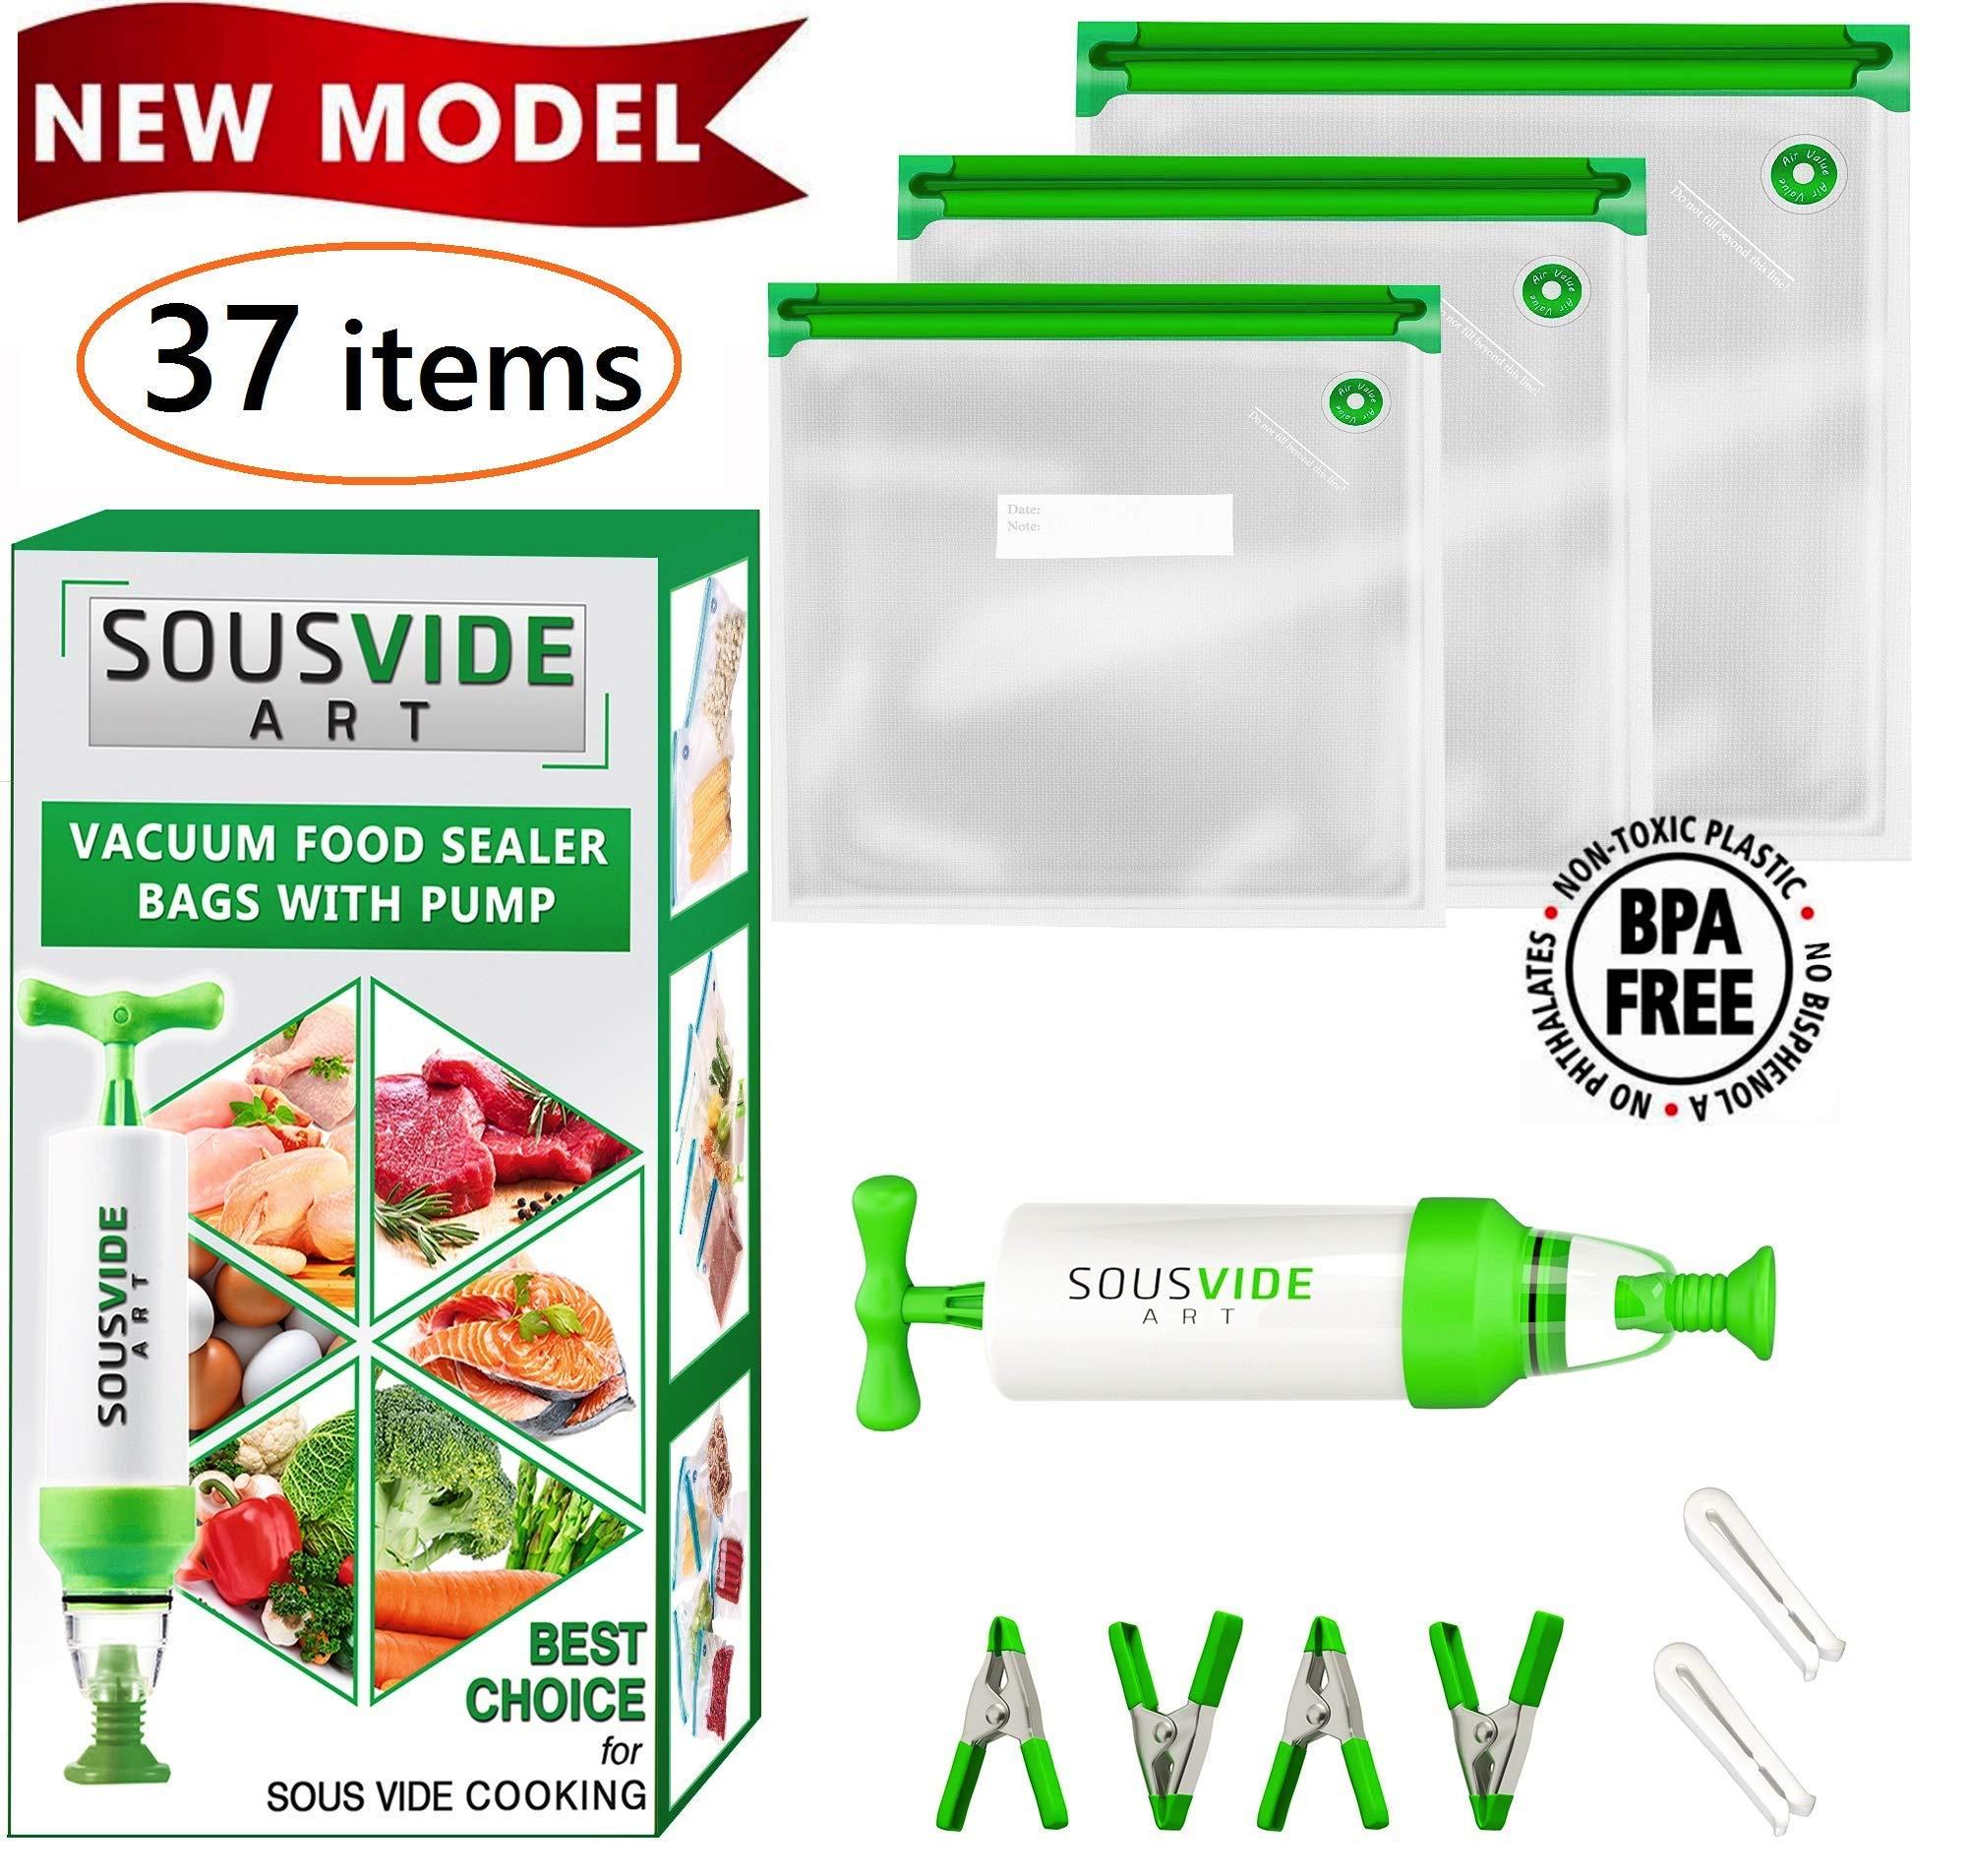 Sous Vide Bags 30 Reusable Vacuum Food Storage Bags Sous Vide Bag Kit 3 Sizes BPA Free - Bags for Sous Vide Cooking (Premium) by SOUSVIDE ART